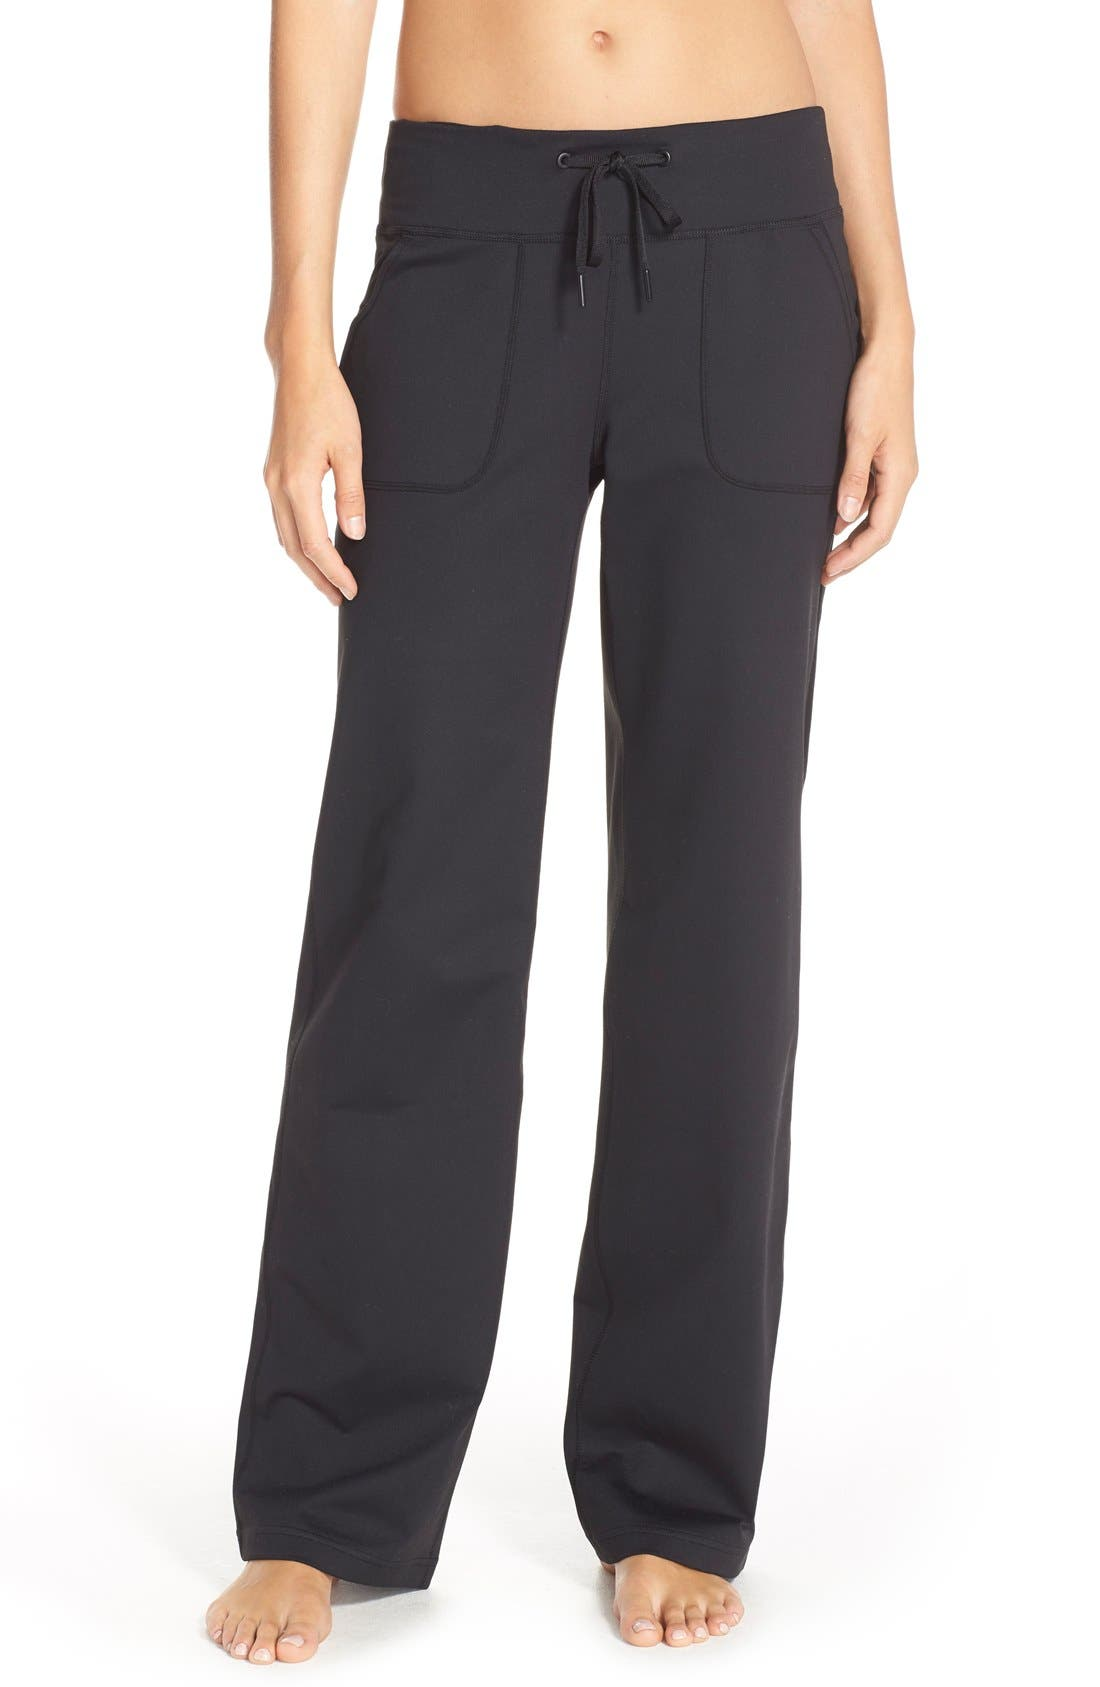 Zella 'Soul 3' Pants